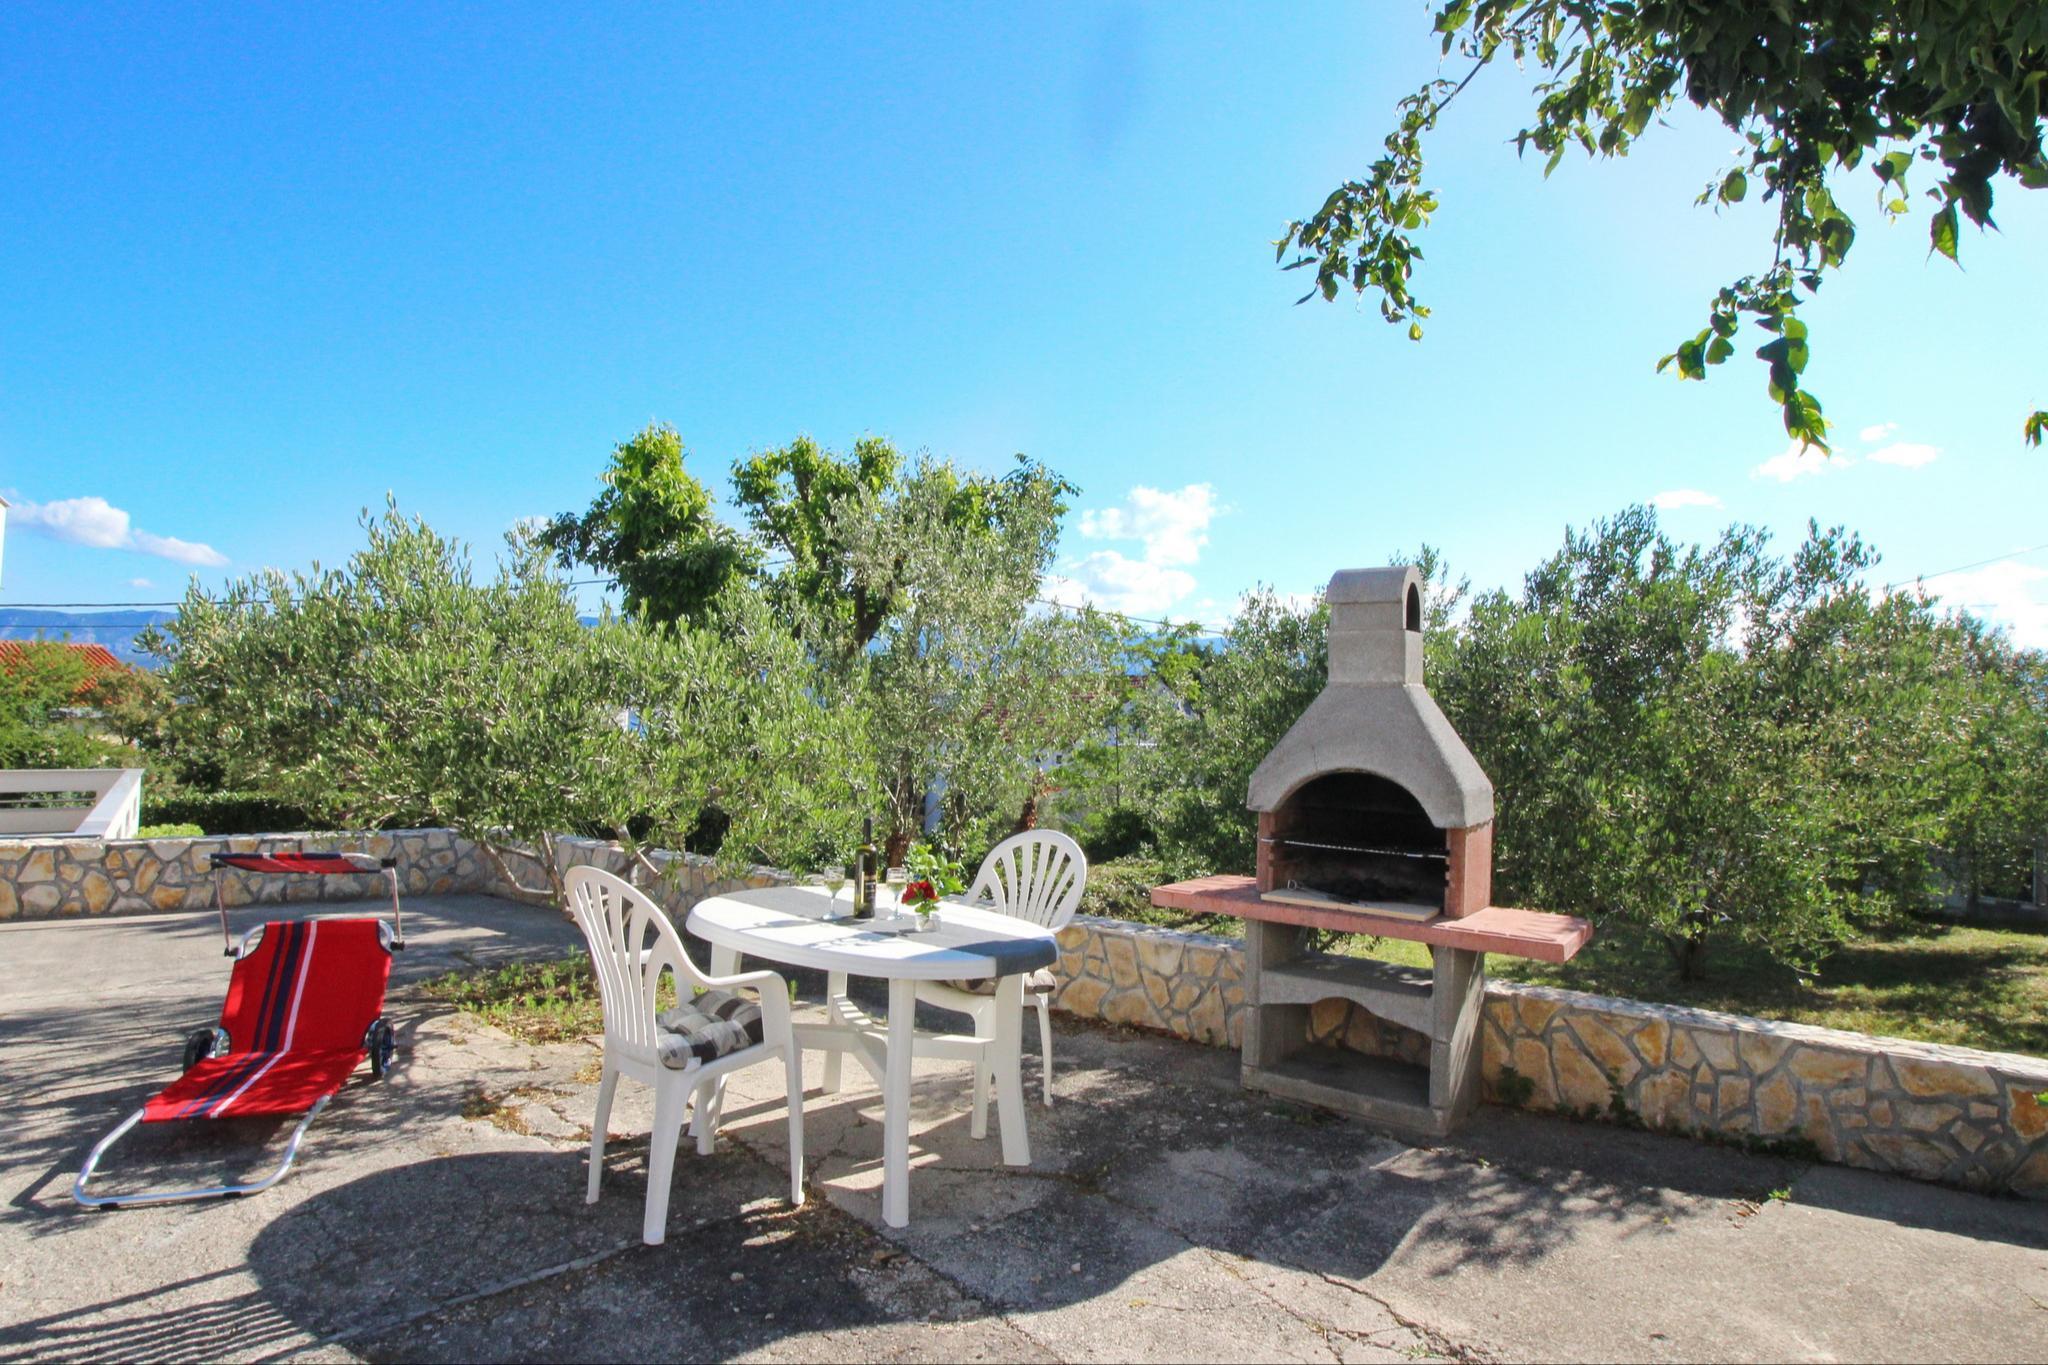 moderne wohnung f r 2 4 in polje mit meerblick haustiere erlaubt objekt nr 4691. Black Bedroom Furniture Sets. Home Design Ideas